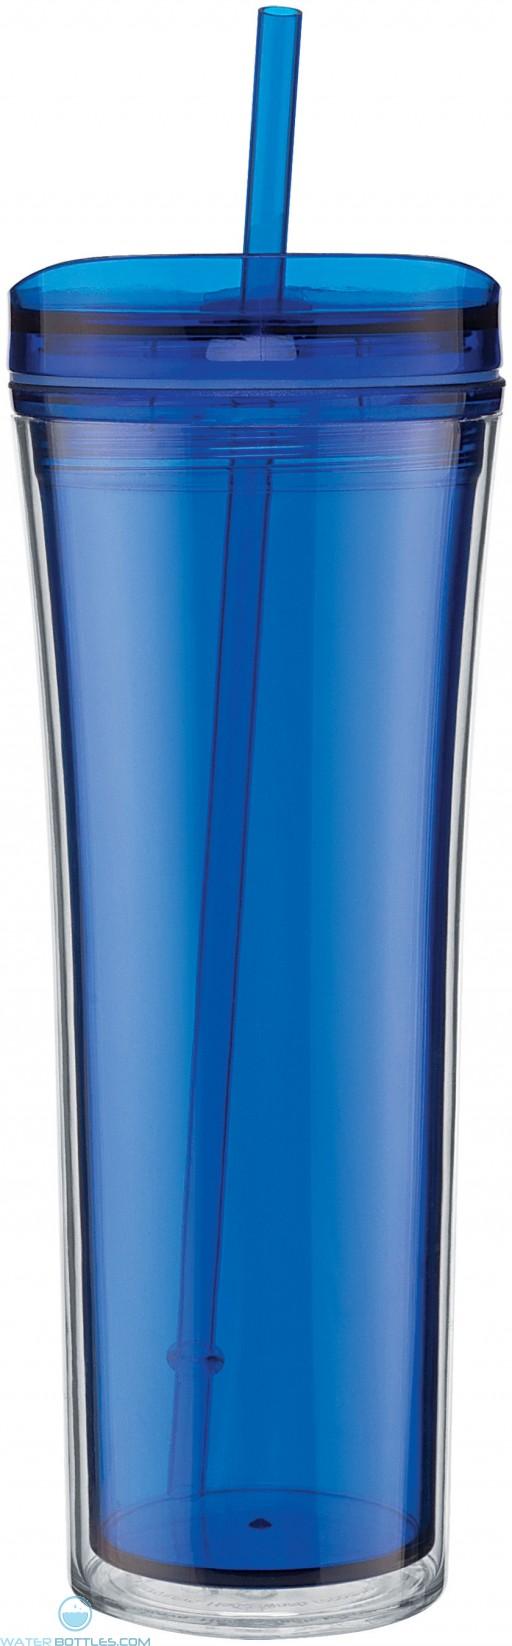 Boost Acrylic Tumblers | 20 oz - Blue